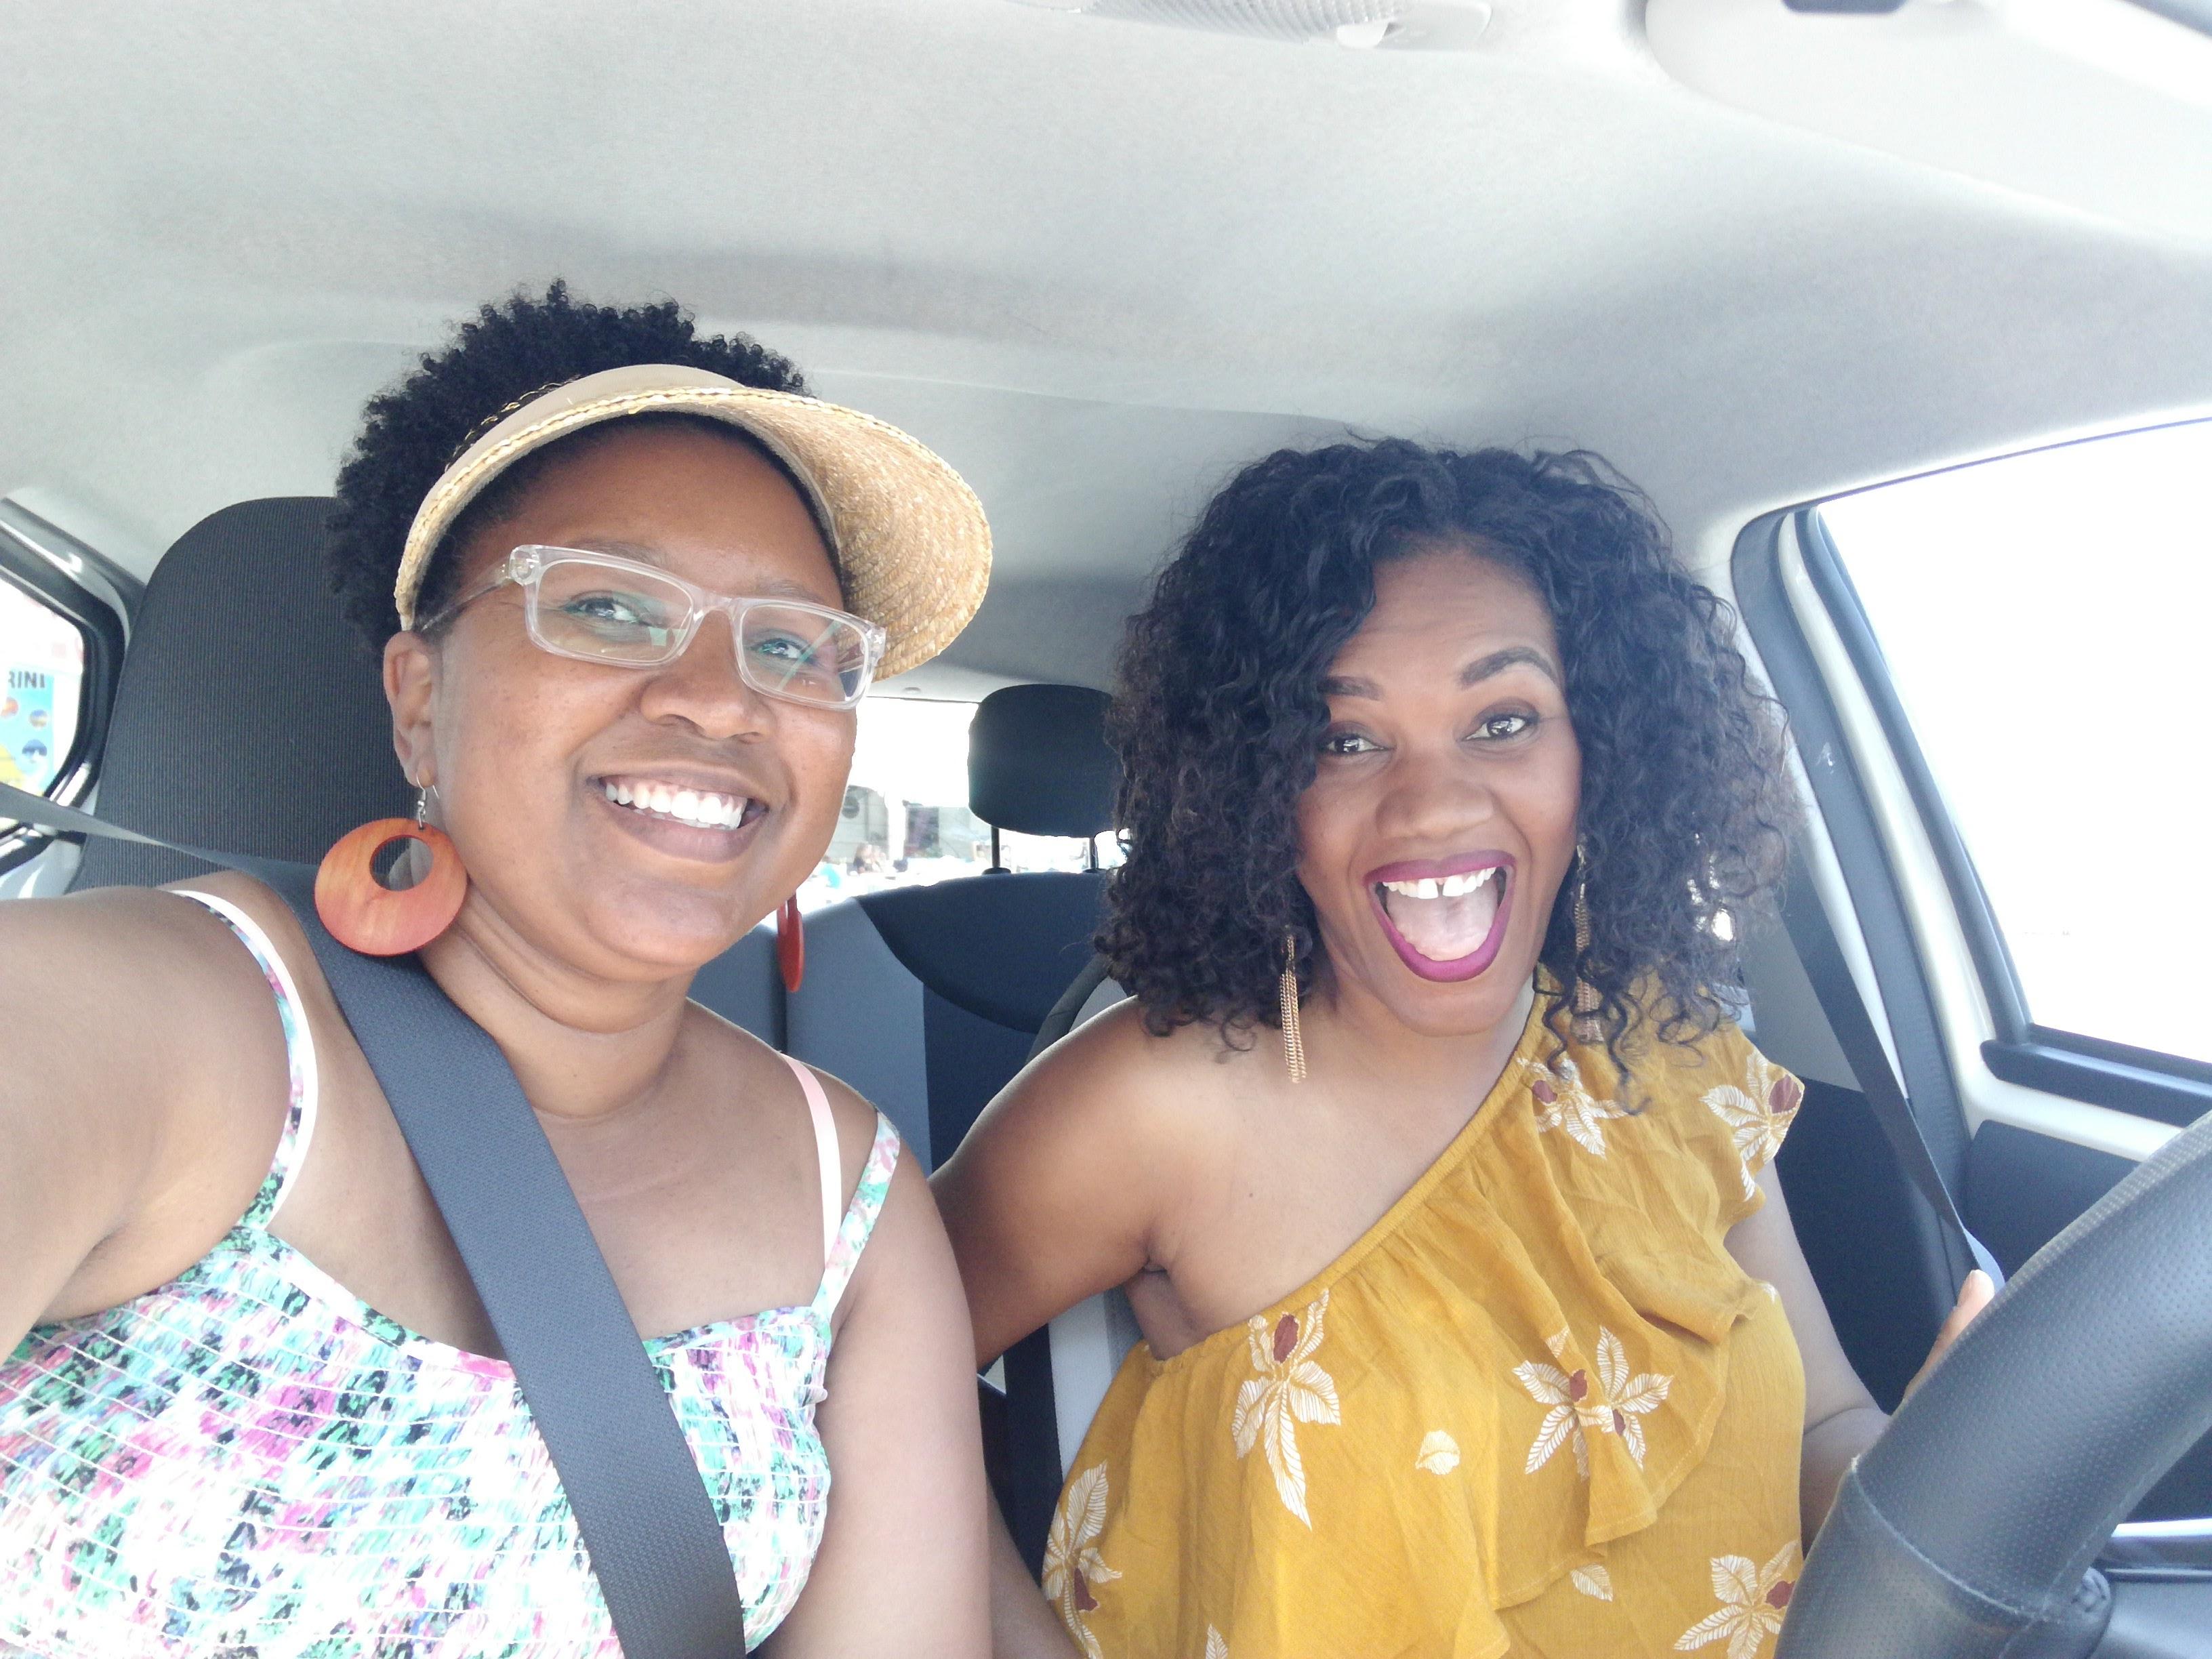 We rented a car